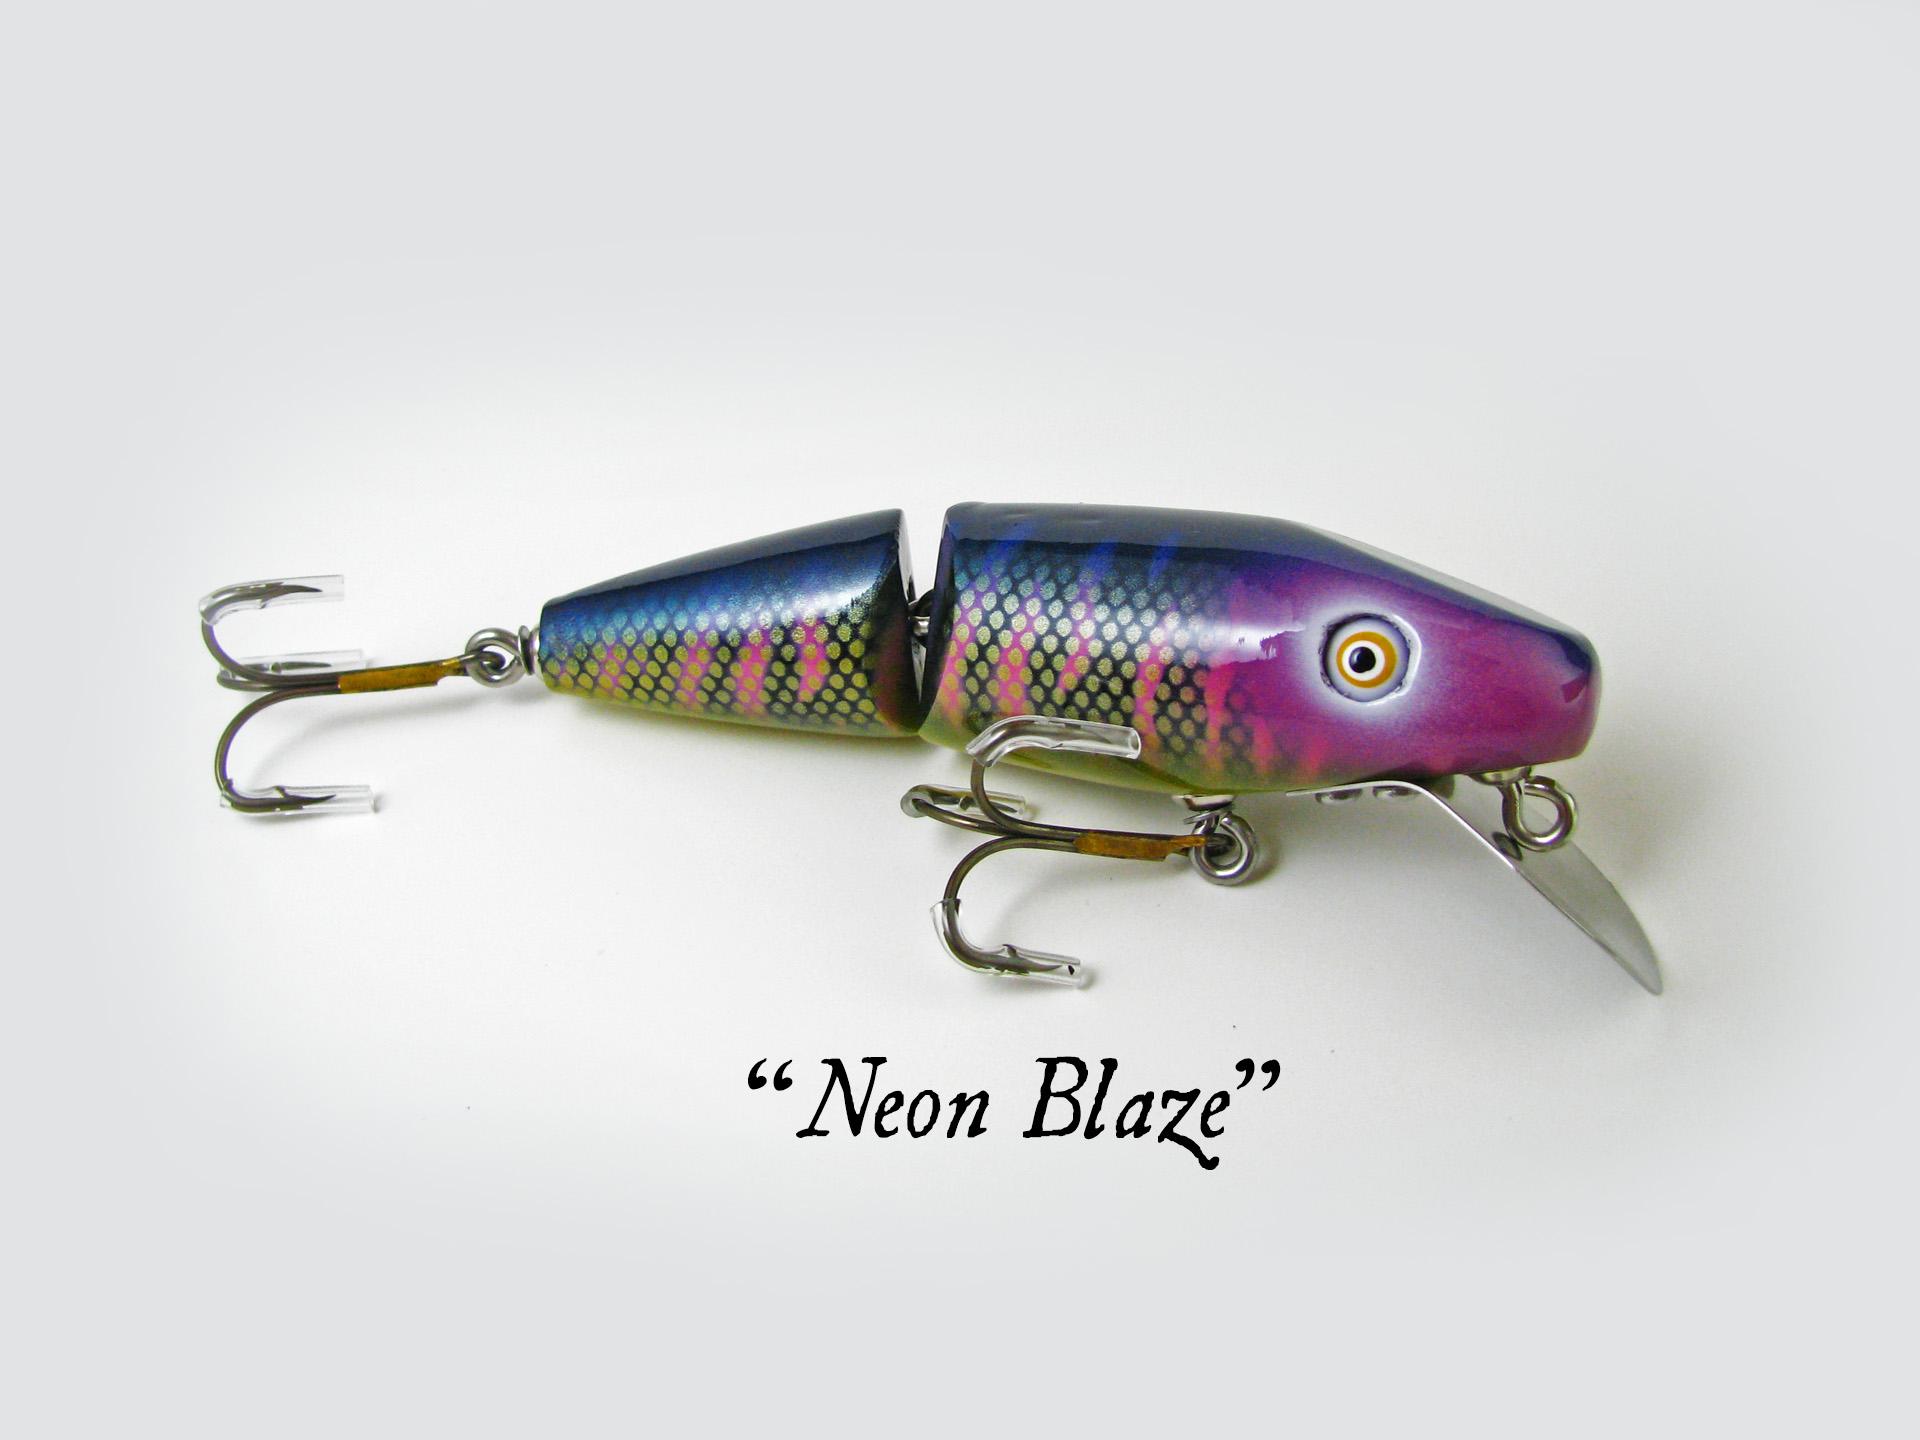 Super Shark_Neon Blaze.jpg